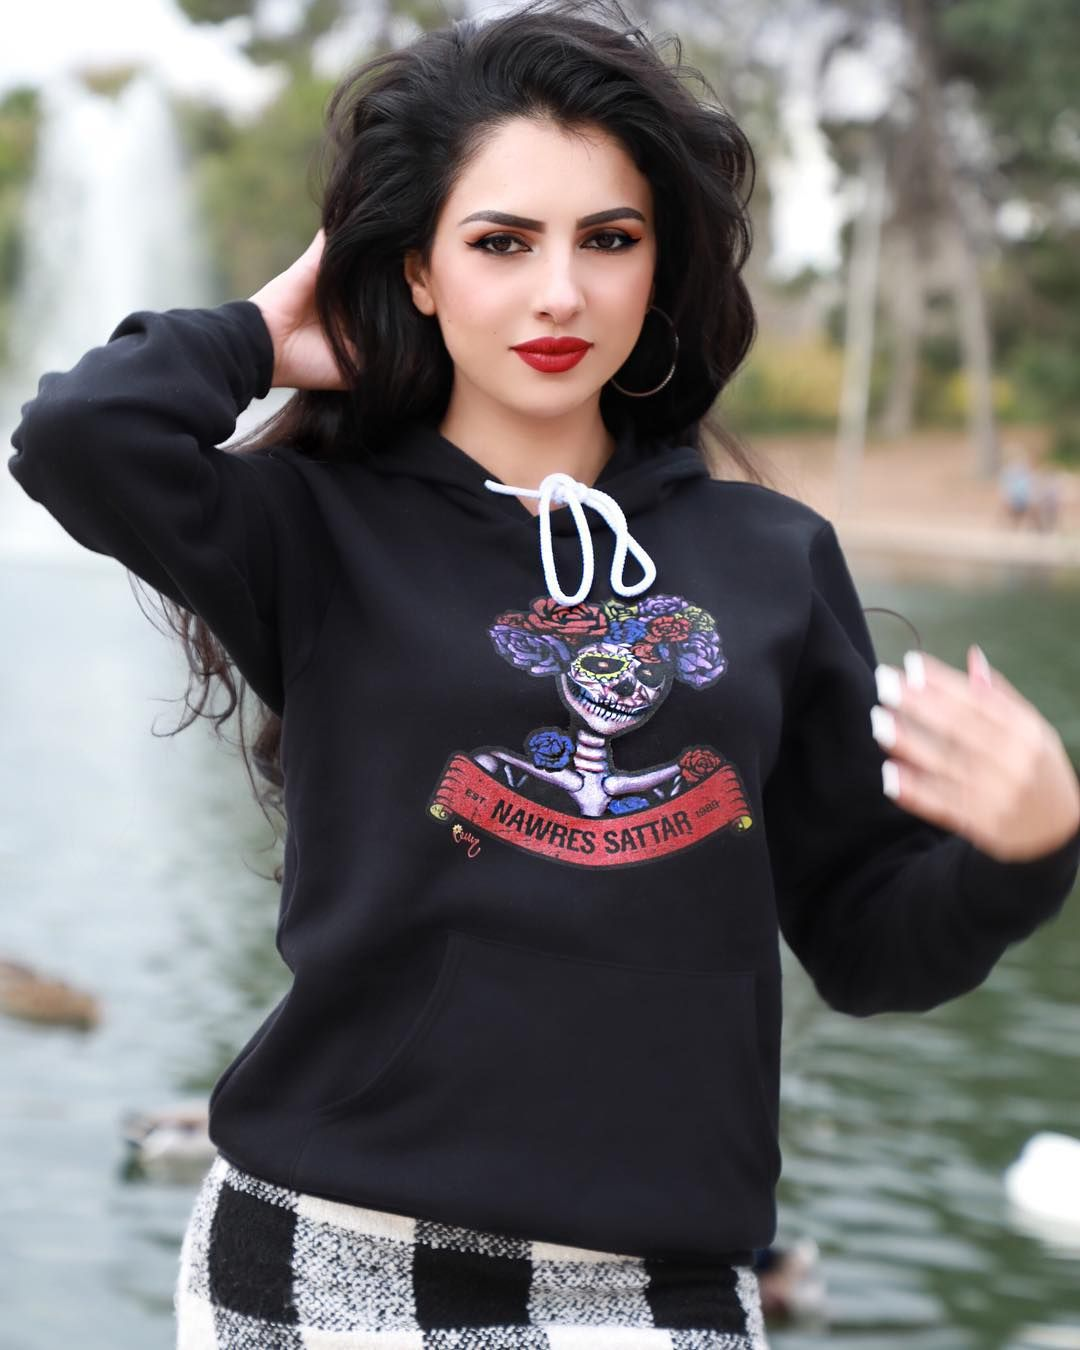 Nawras Sattar نورس ستار On Instagram My Own Art On My Own Hoodie اني رسمت هذا الهودي Nawrassattarmerch شكرا على تع Beauty Girl Girl Fashion